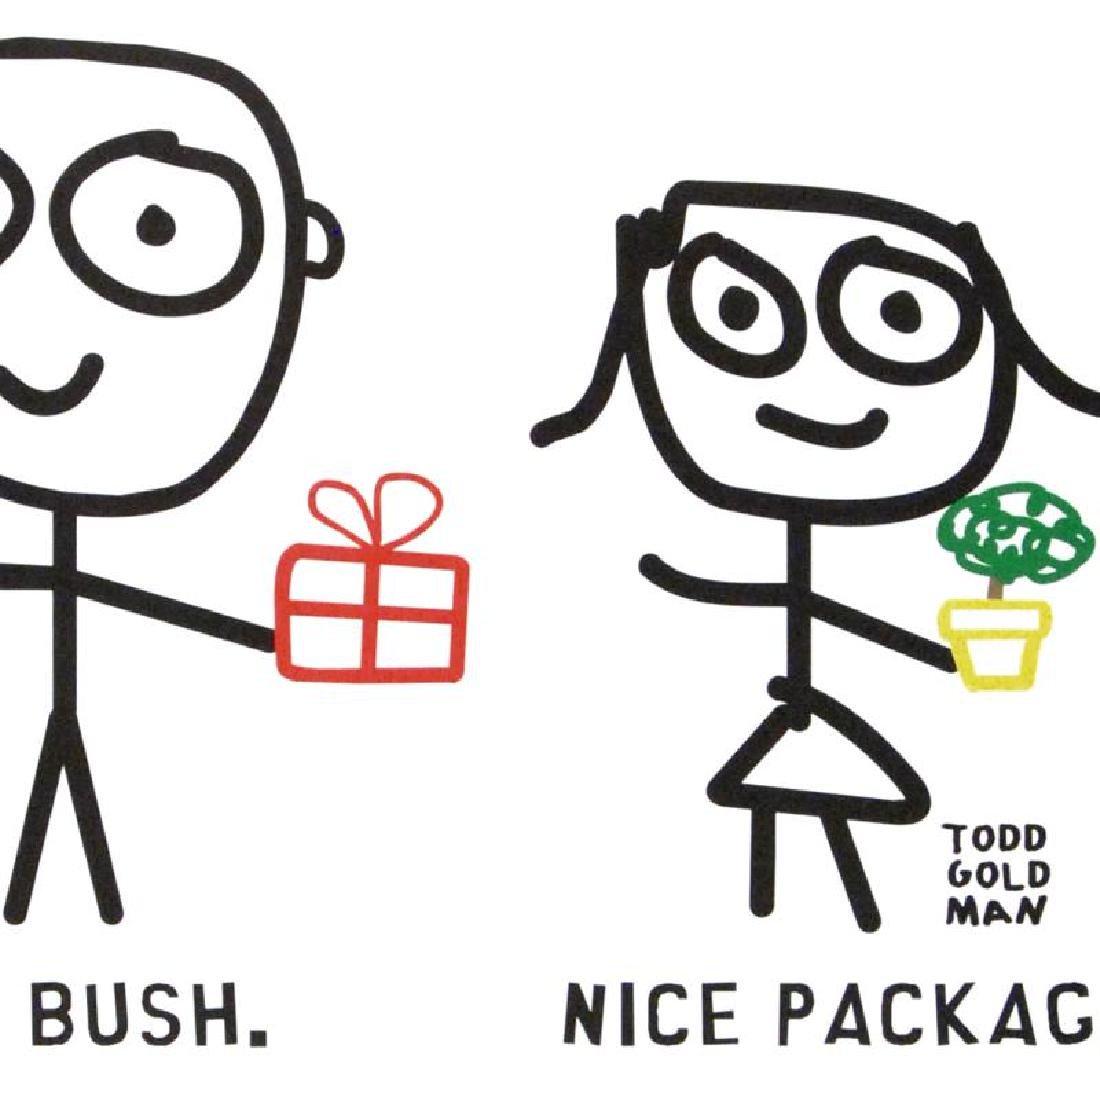 """Nice Package. Nice Bush."" Fine Art Litho Poster (36"" x - 4"